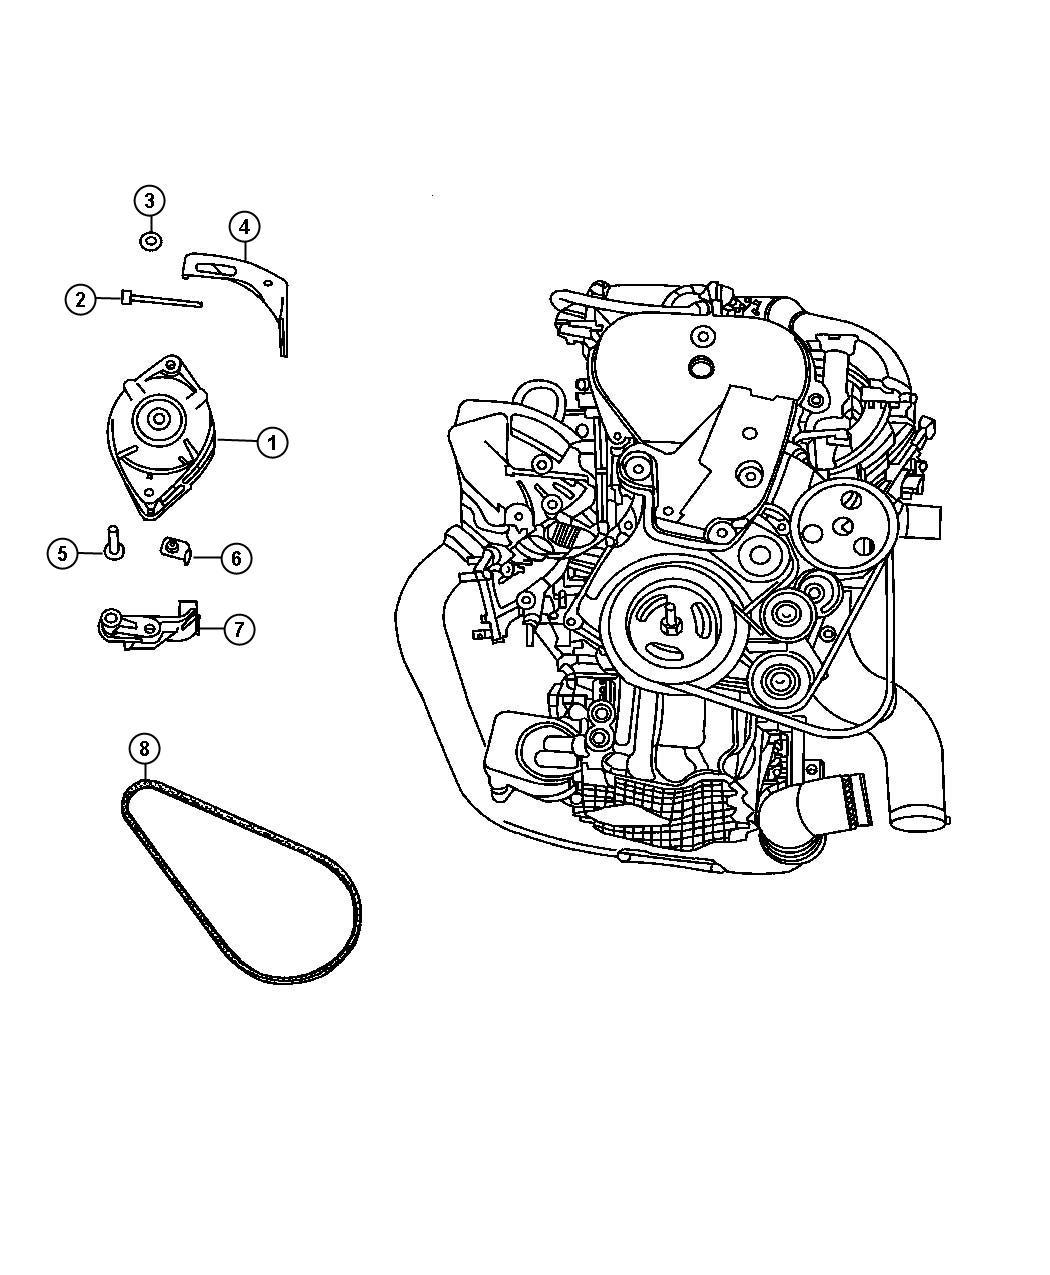 Chrysler Pt Cruiser Generator Engine Remanufactured